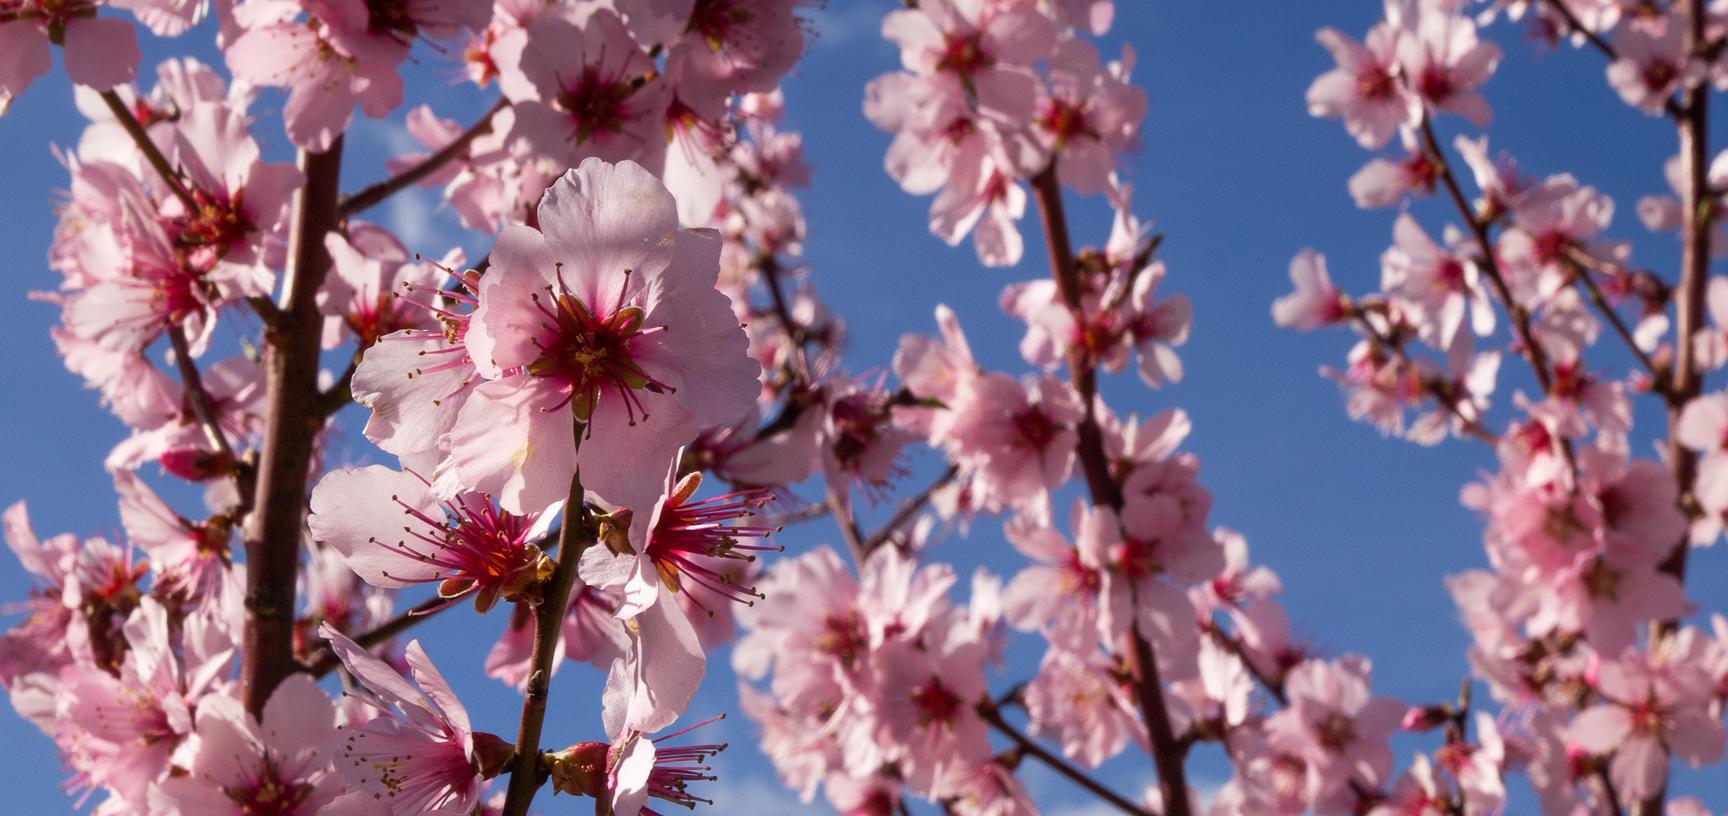 prunus dulcis robin  almond tree  plants that changed the world  lower garden  botanic garden  pattern